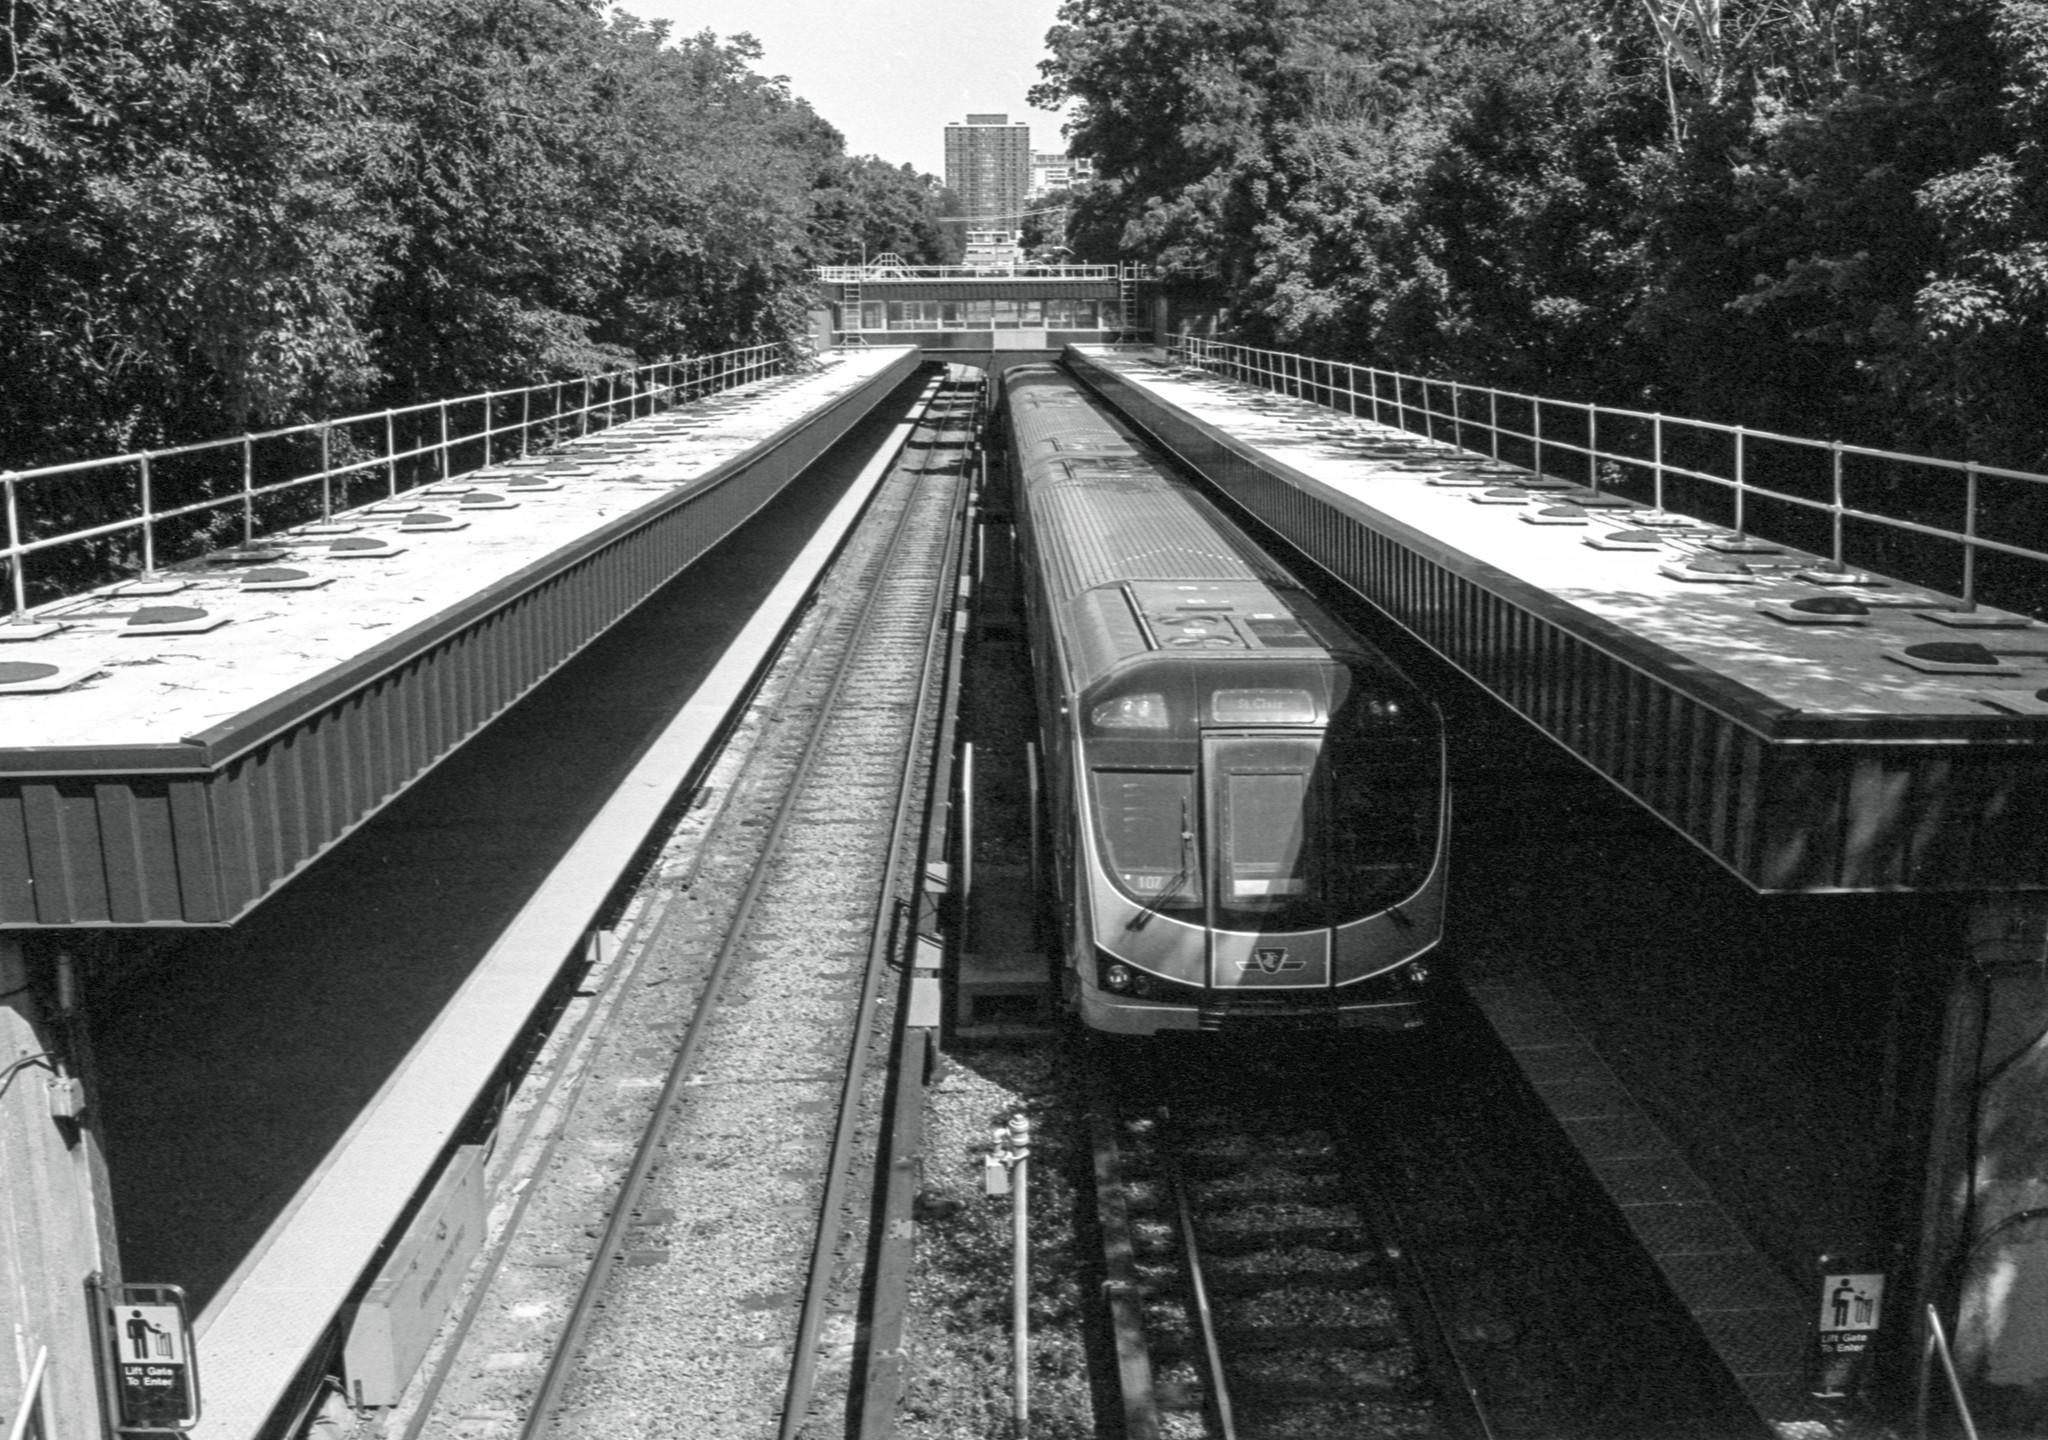 Rosedale Subway Station, Pentax KM, SMC Pentax K 28 f3.5 lens, Kosmo Mono 100